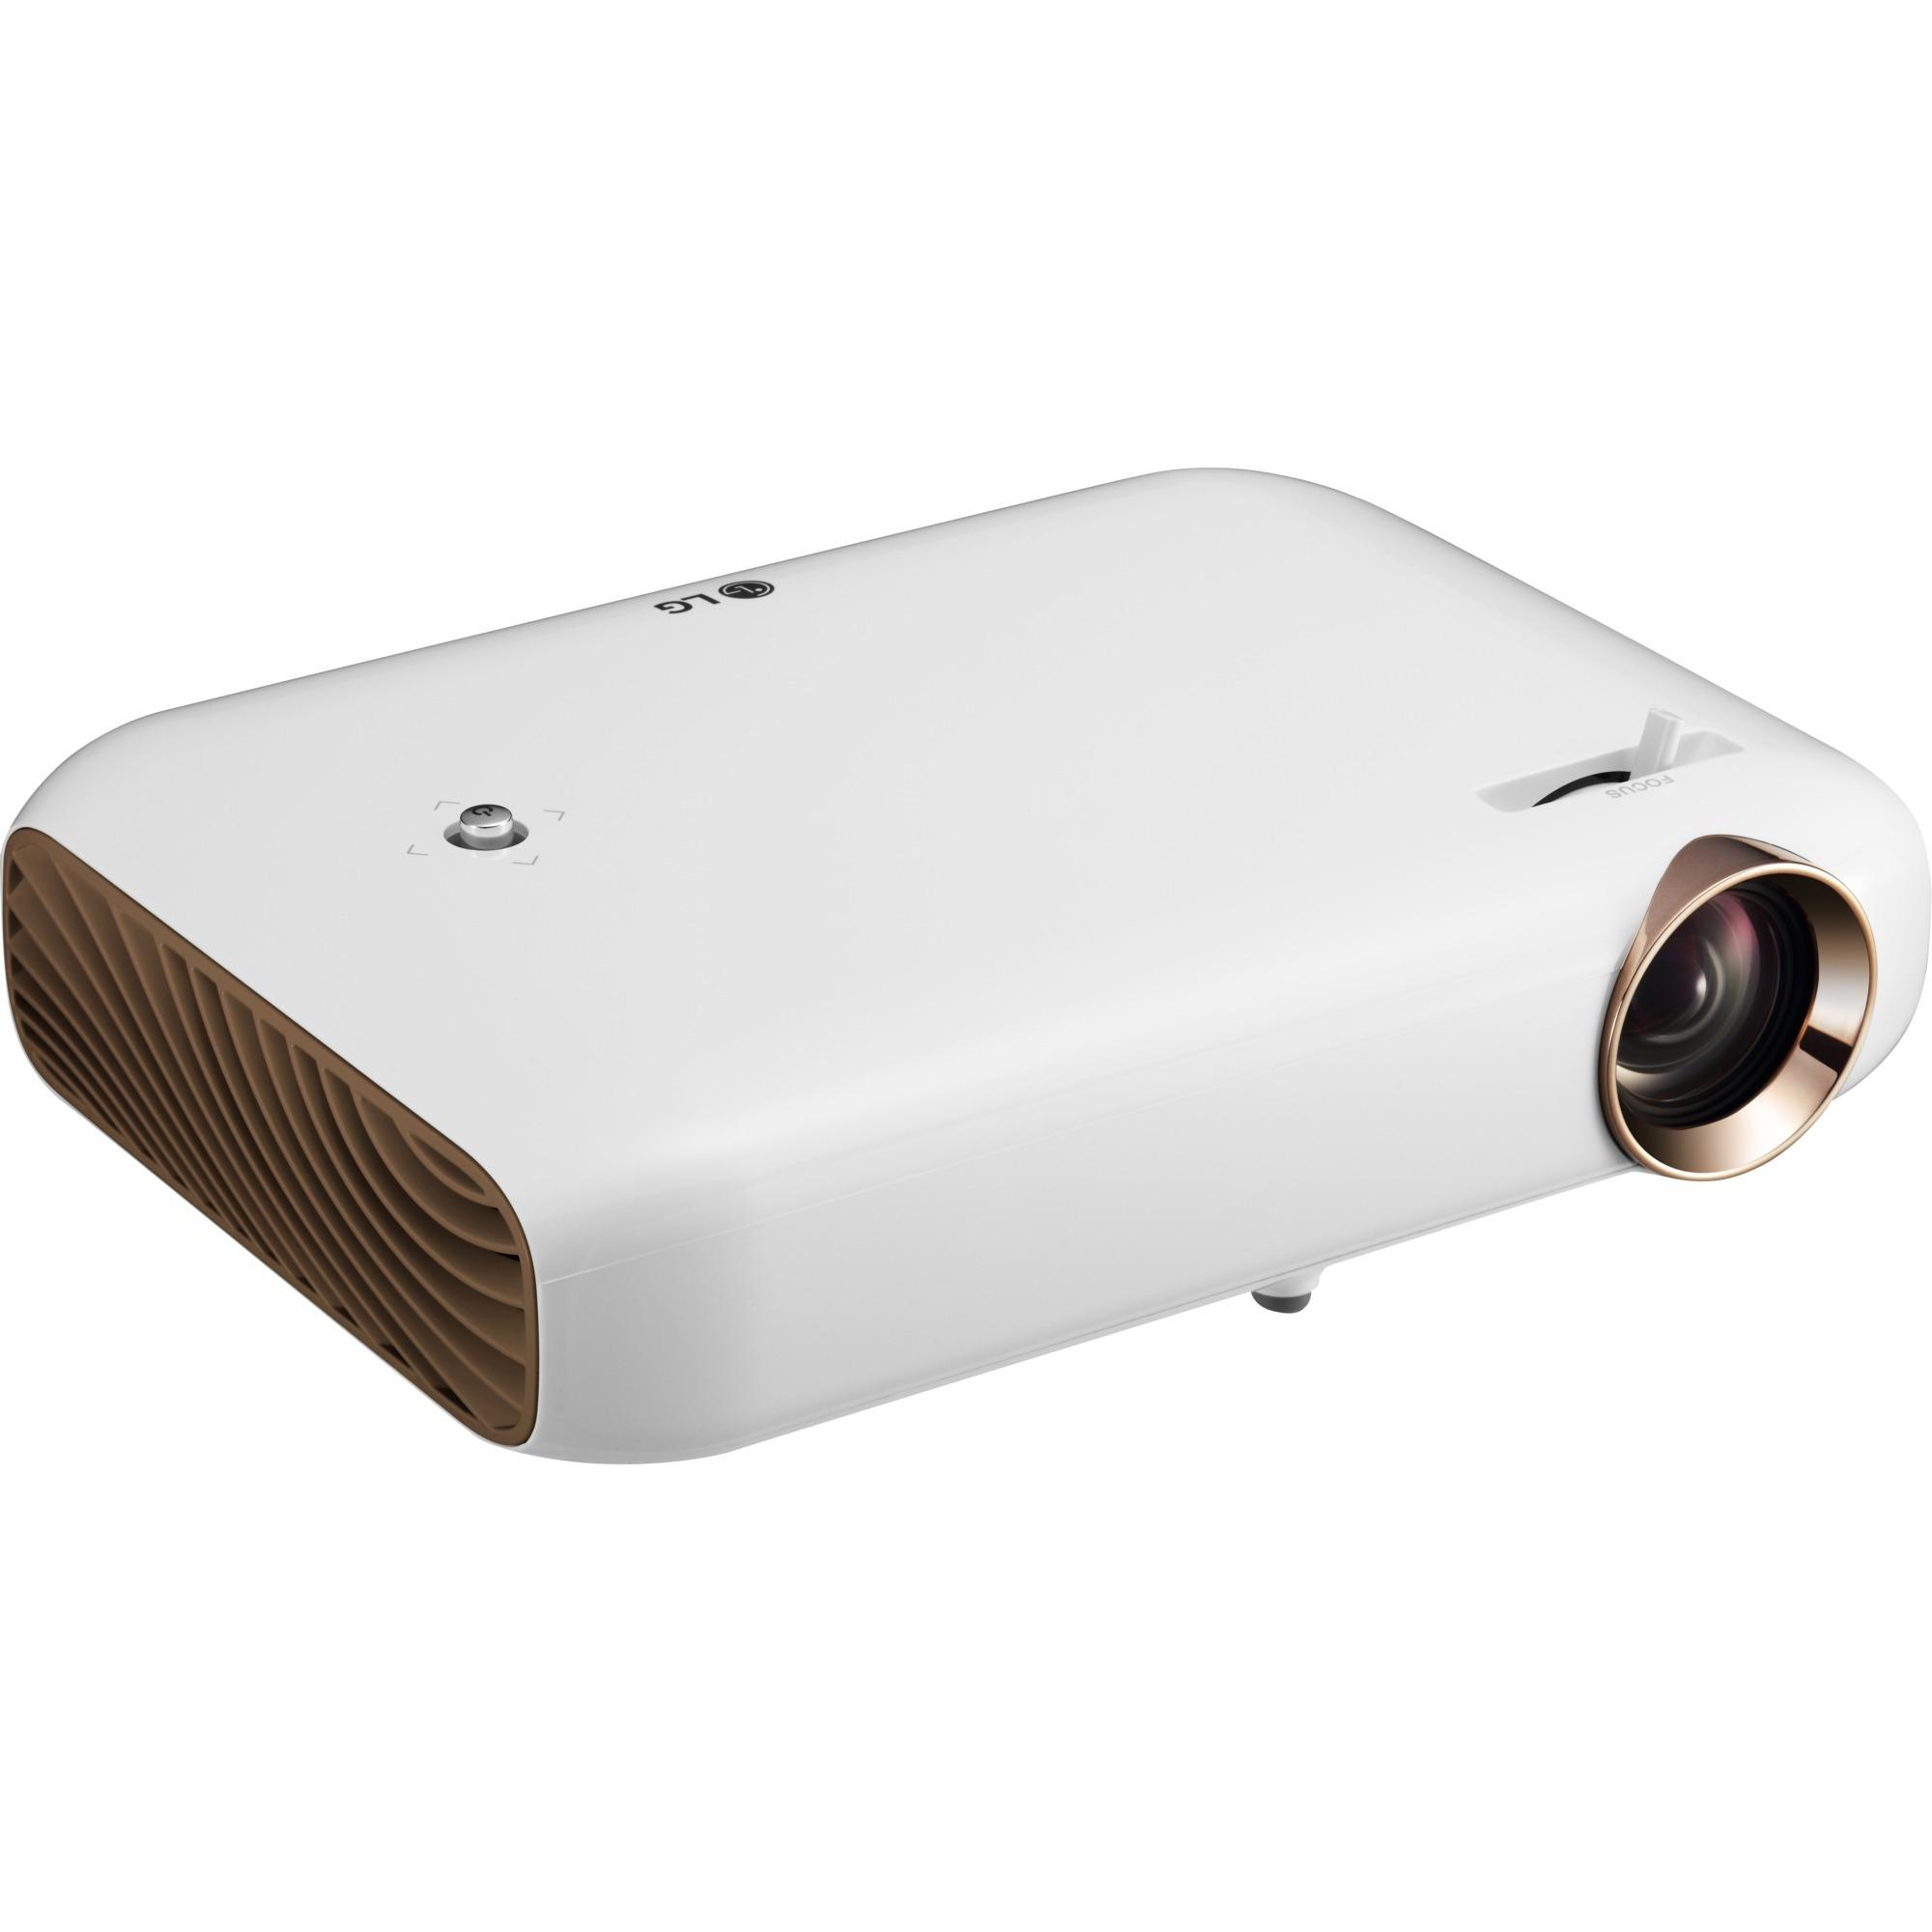 PW1500G 1500lúmenes ANSI LED WXGA (1280x800) 3D Blanco videoproyector, Proyector LED